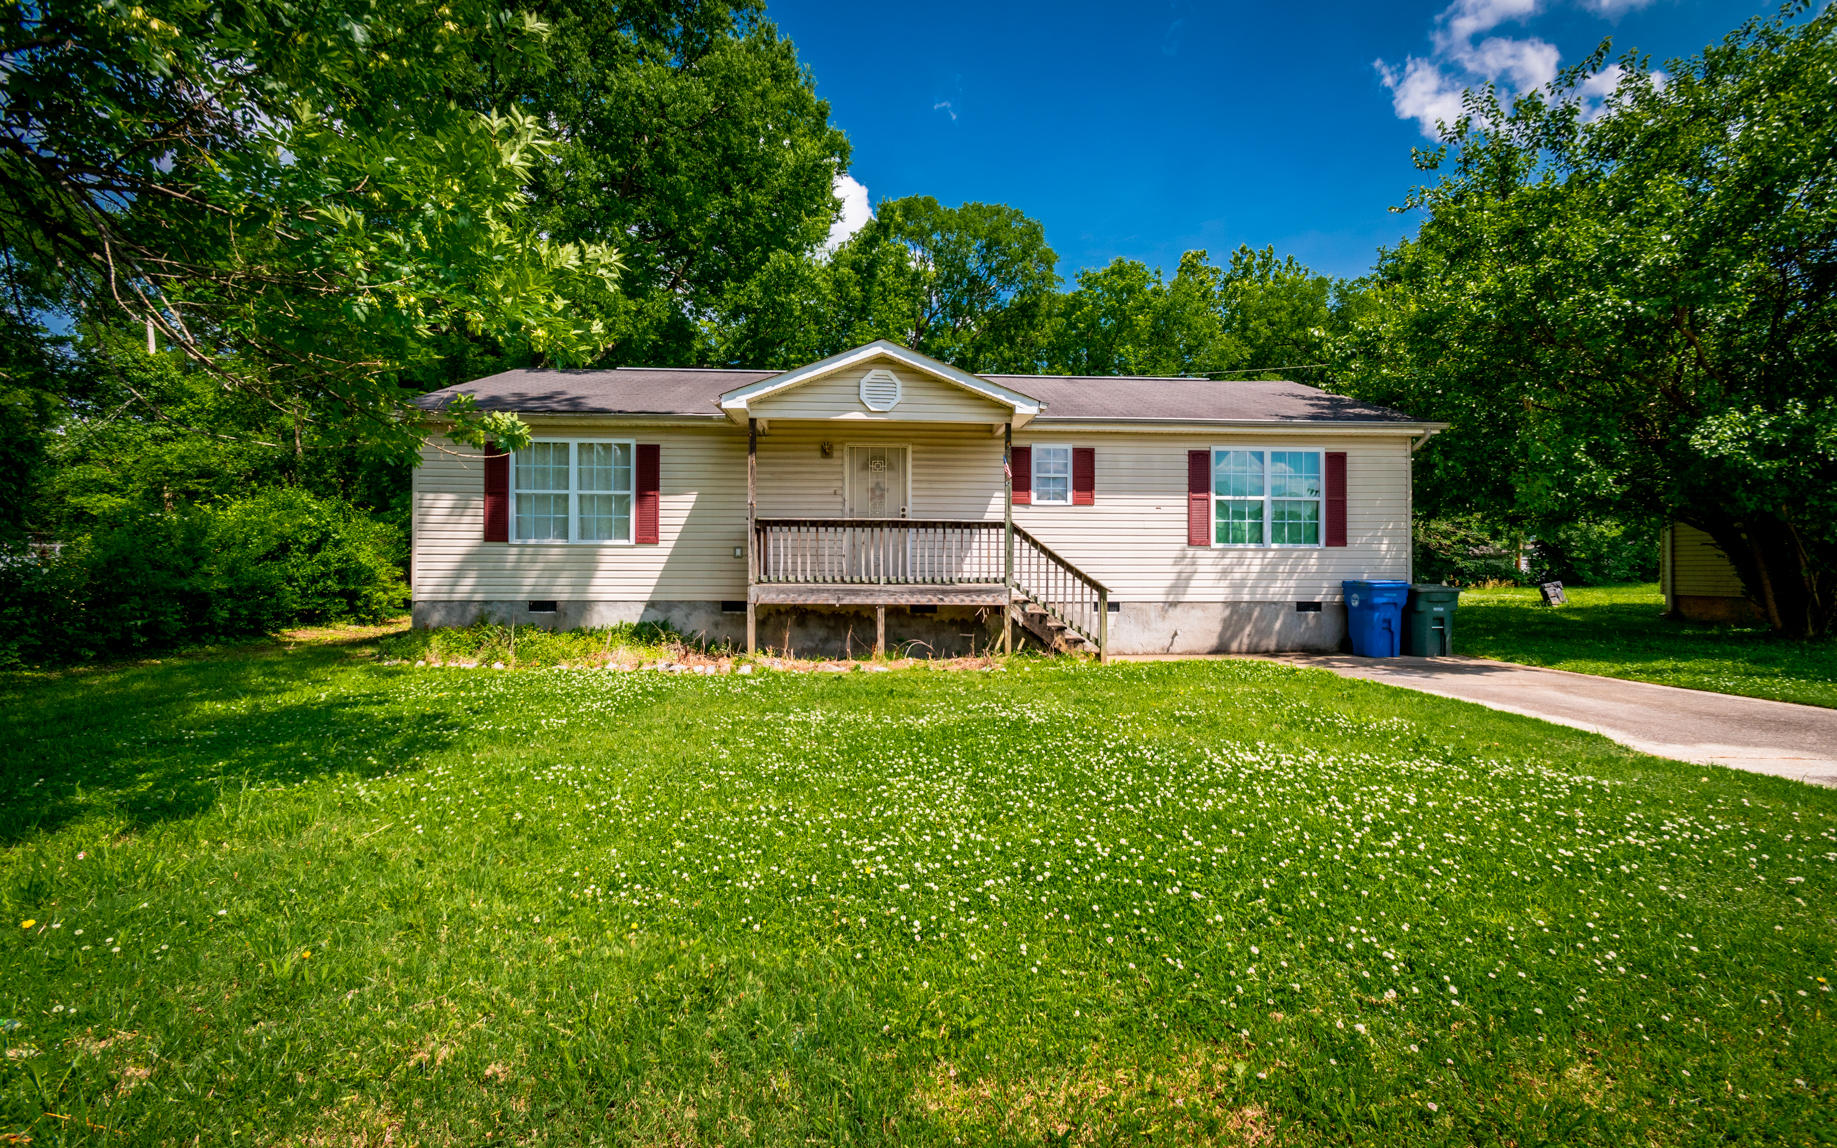 578 N Kelley St, Chattanooga, TN 37404